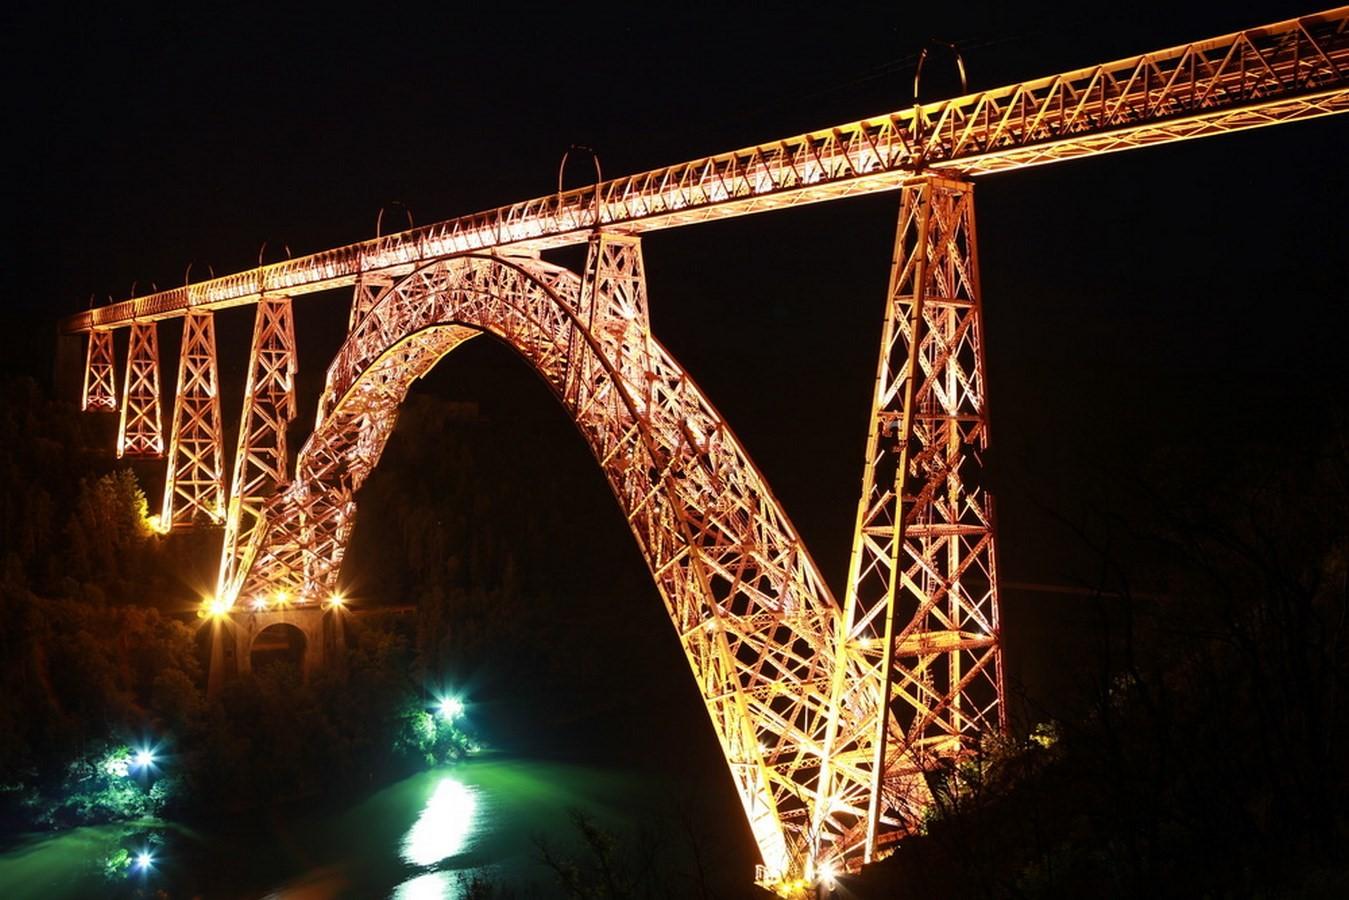 Garabit Viaduct, France – 1884 - Sheet2